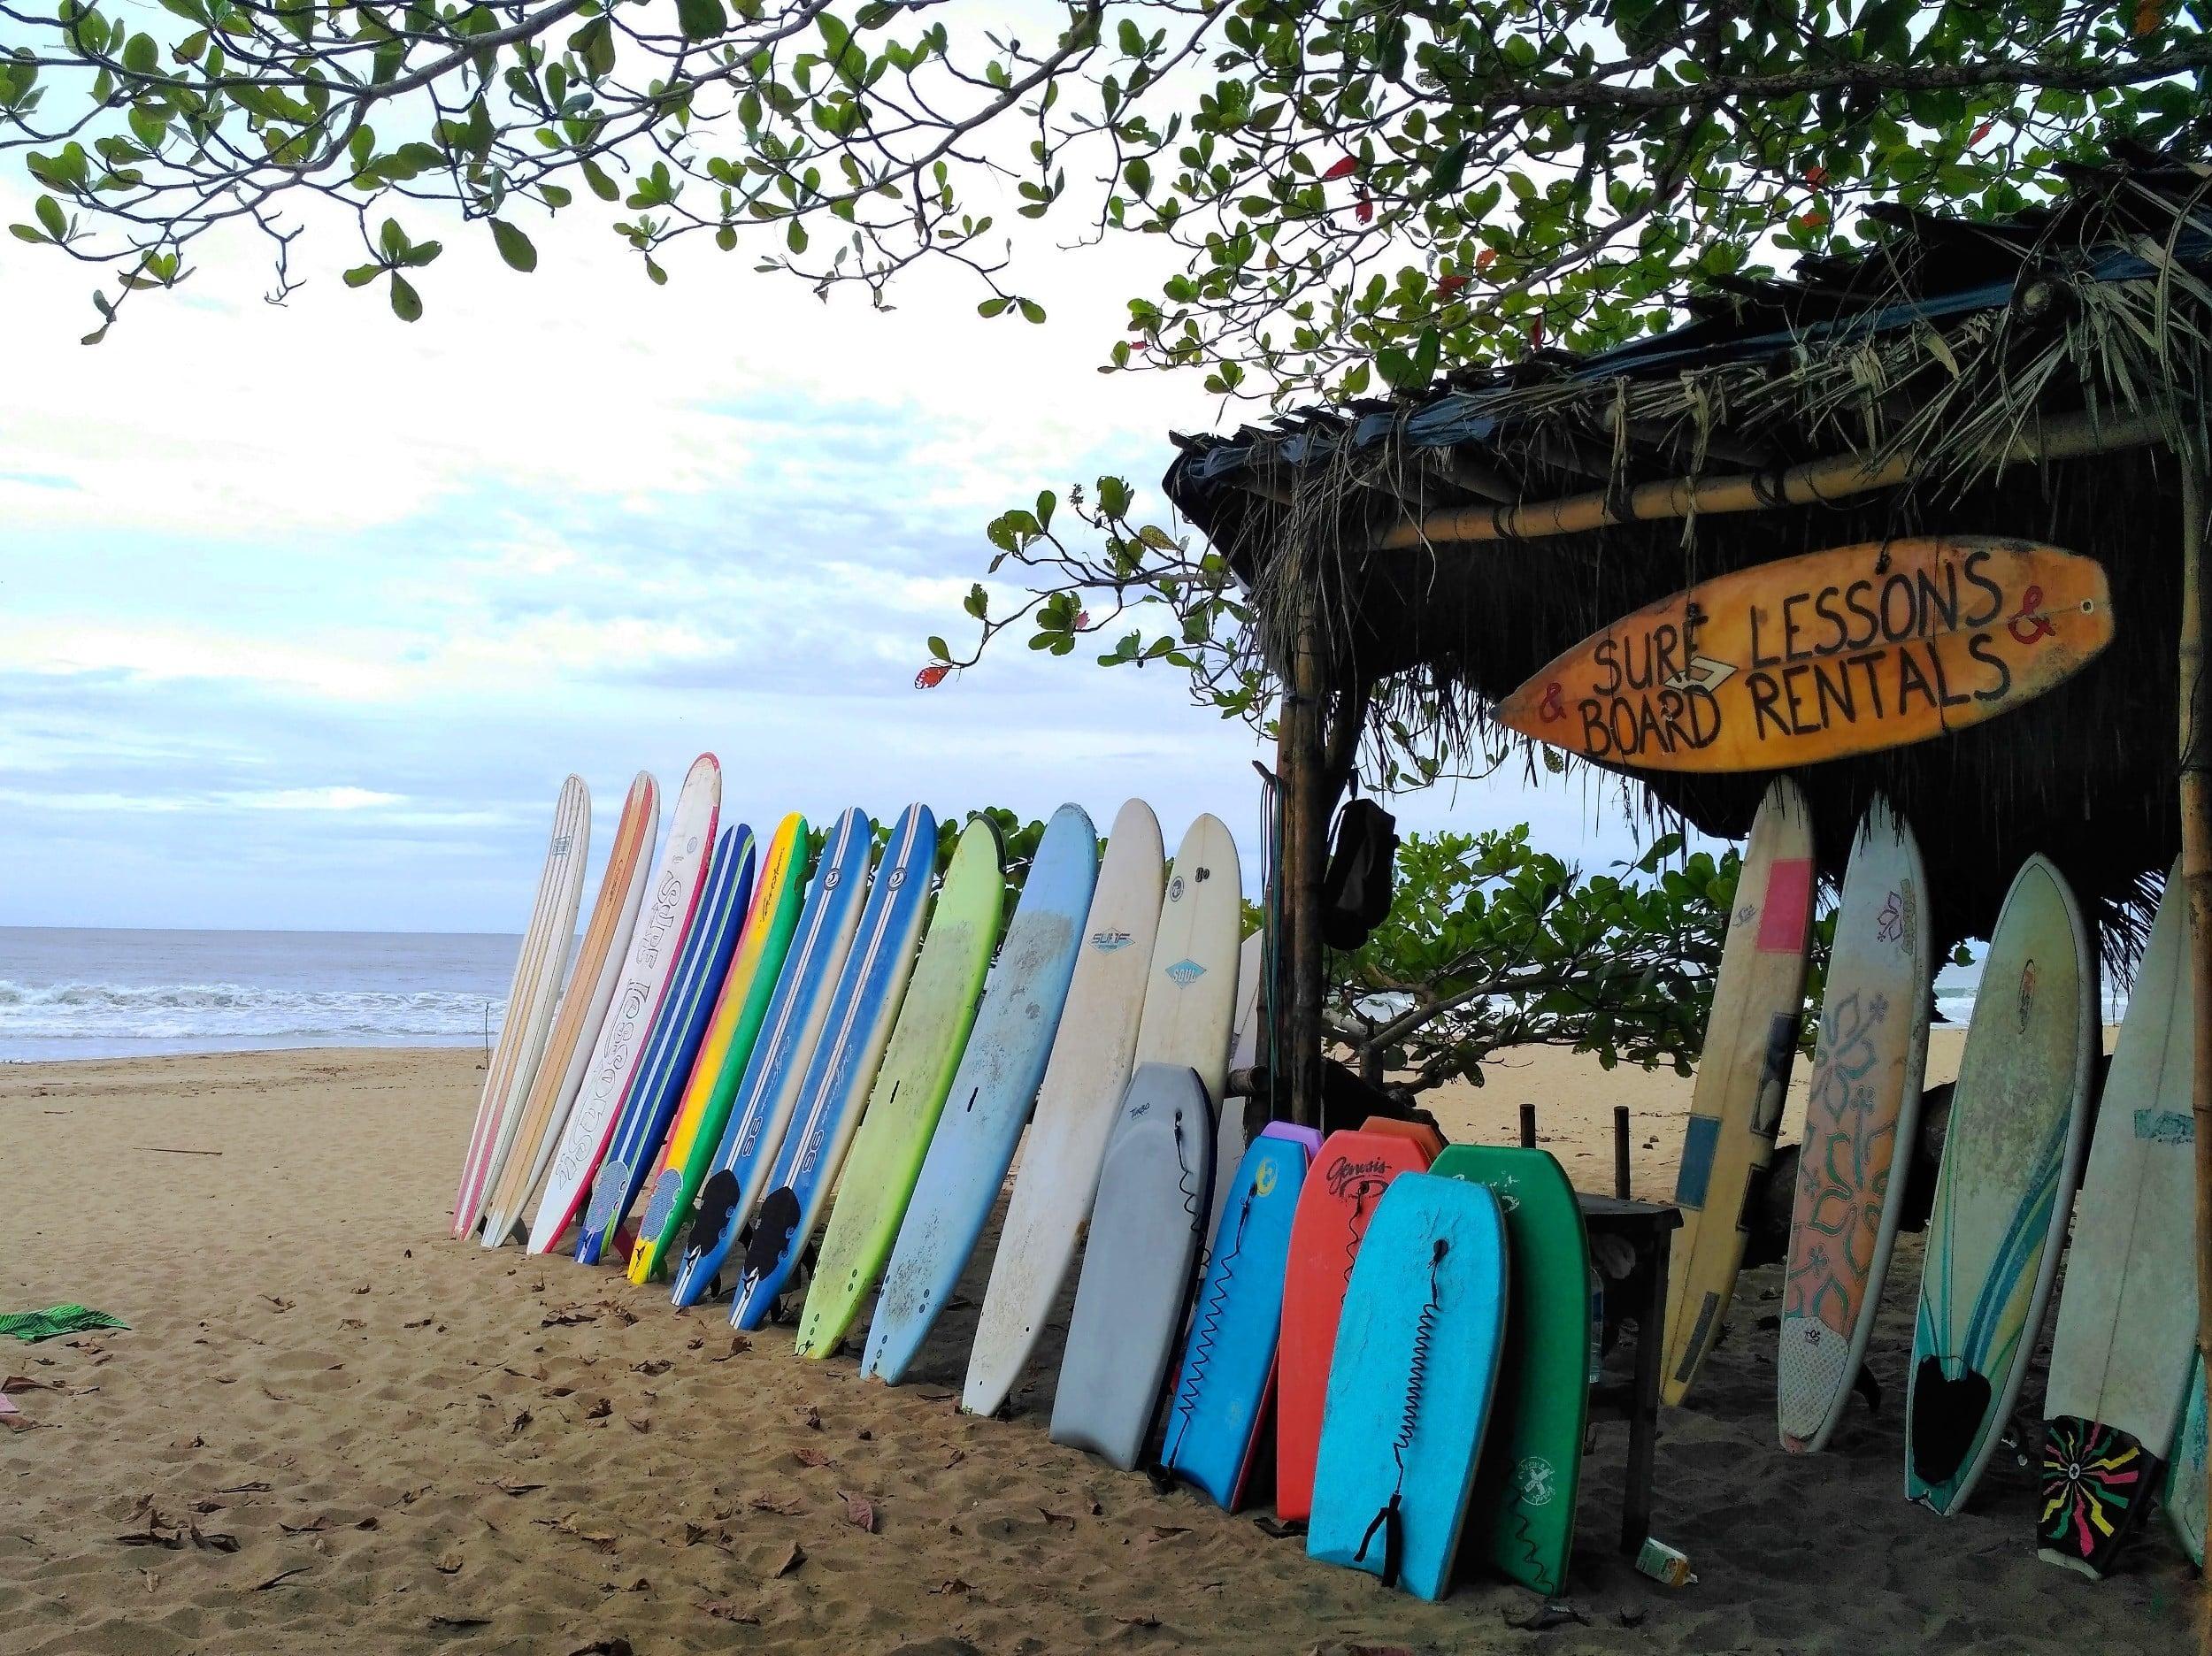 surfboard hire in Santa Teresa costa rica